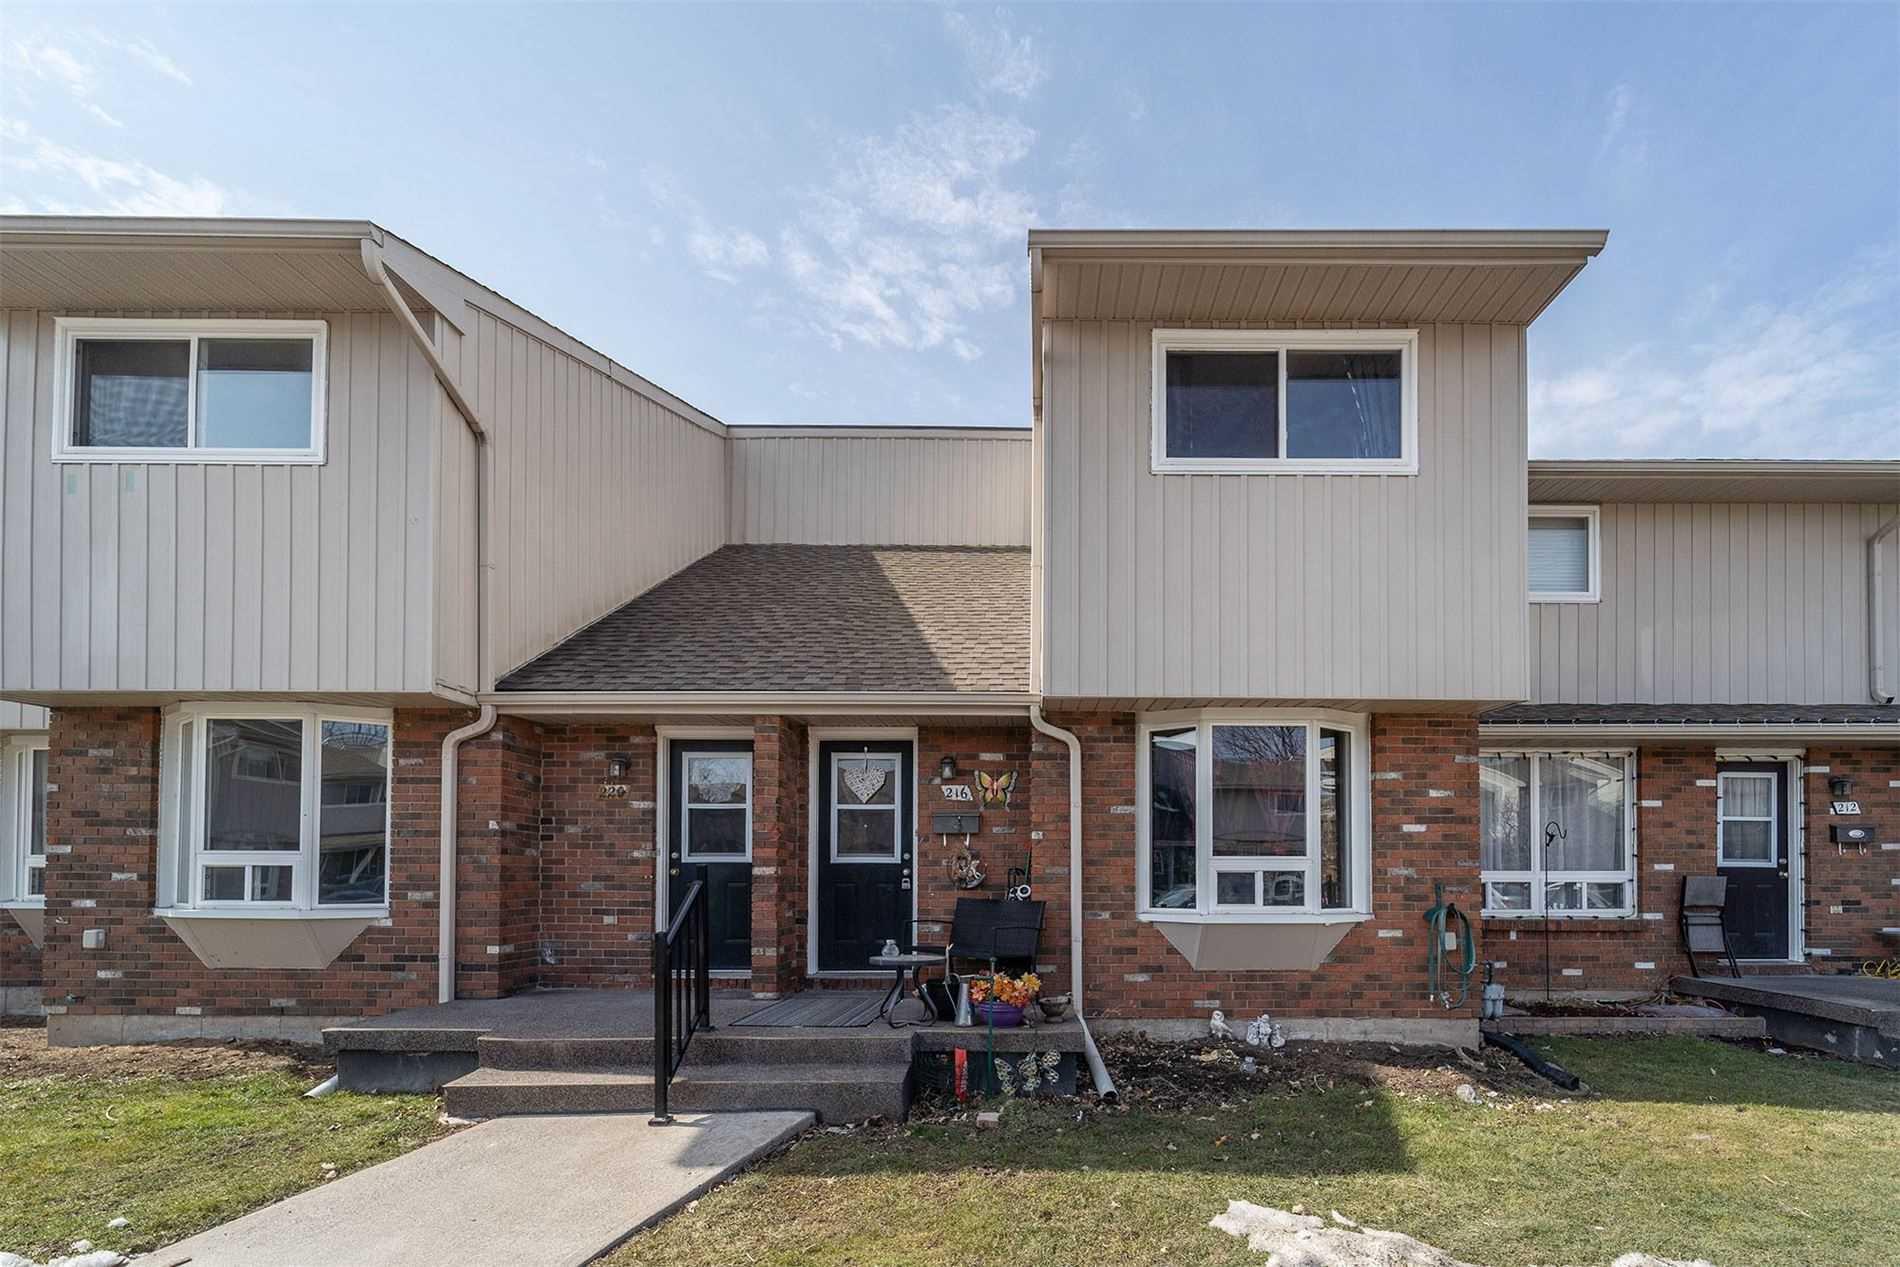 216 - 100 Brownleigh Ave